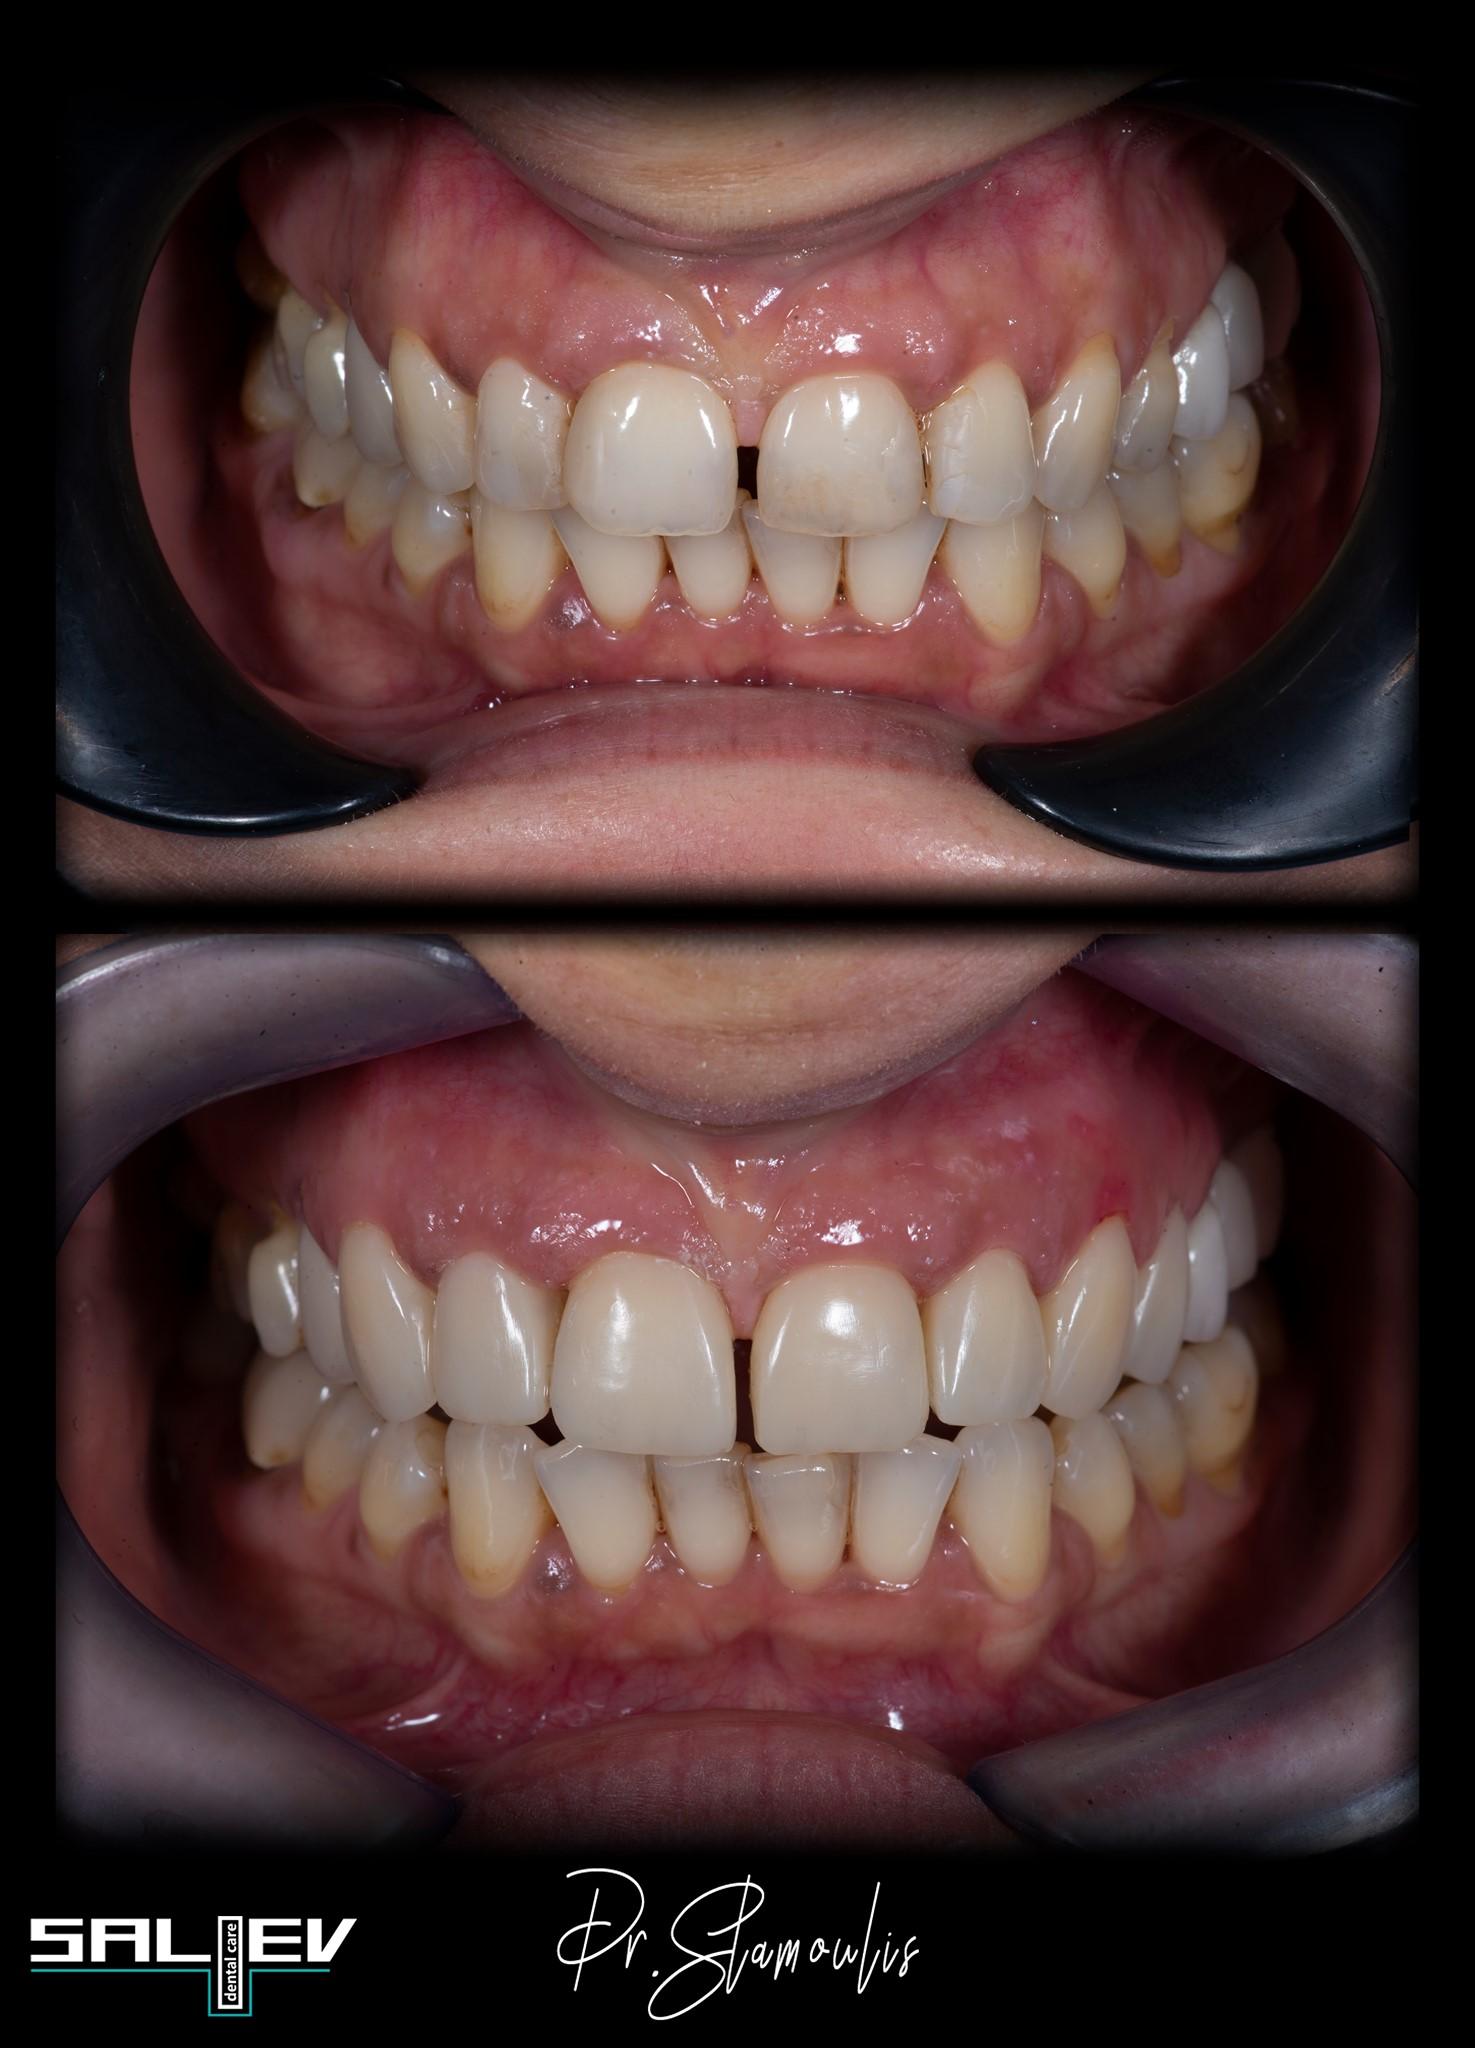 Импланти, Салиев Дентал Кеър, Бондинг, Dental clinic Sofia